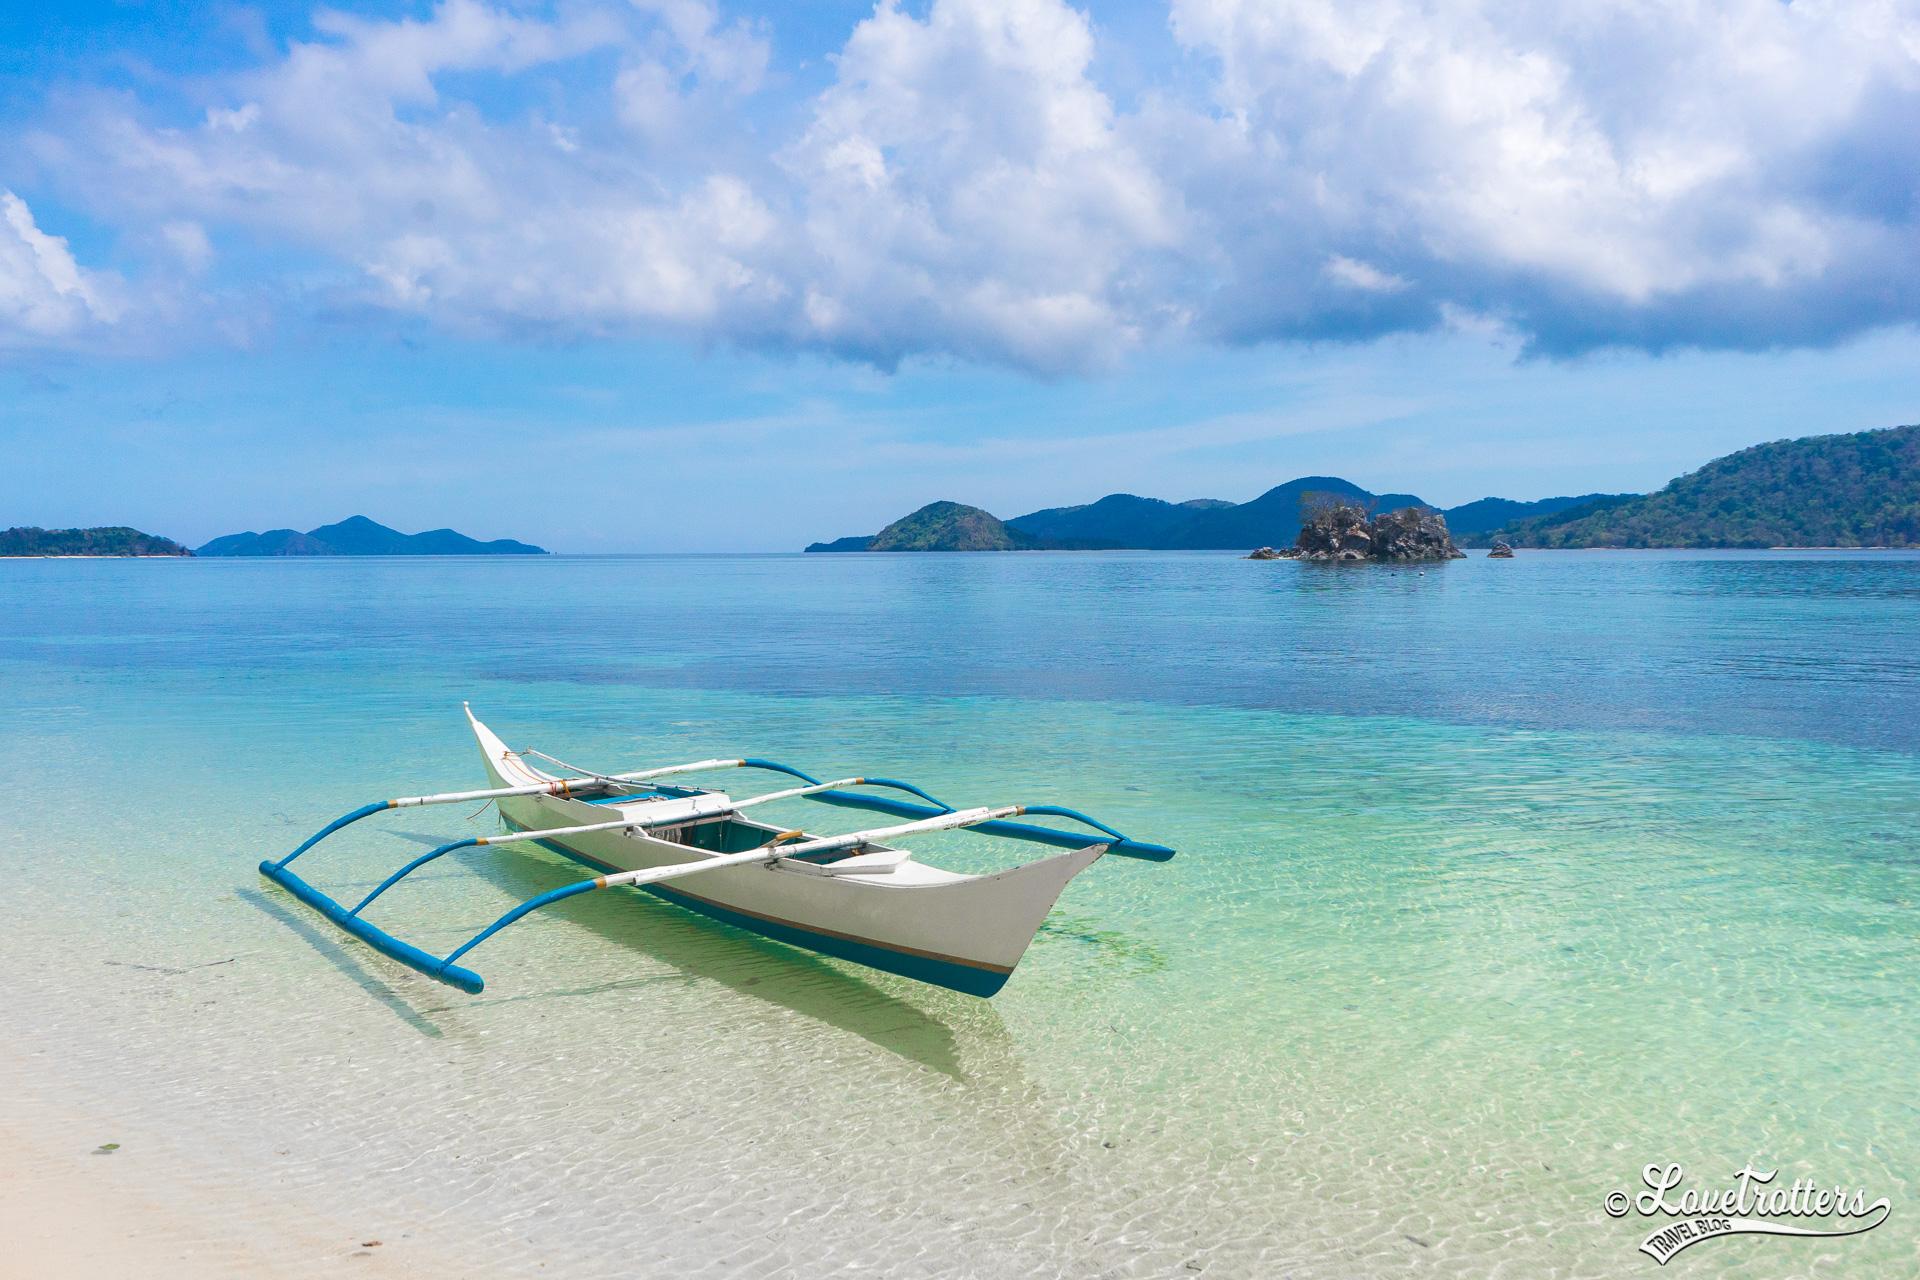 Une bangka, un bateau balancier des Philippines